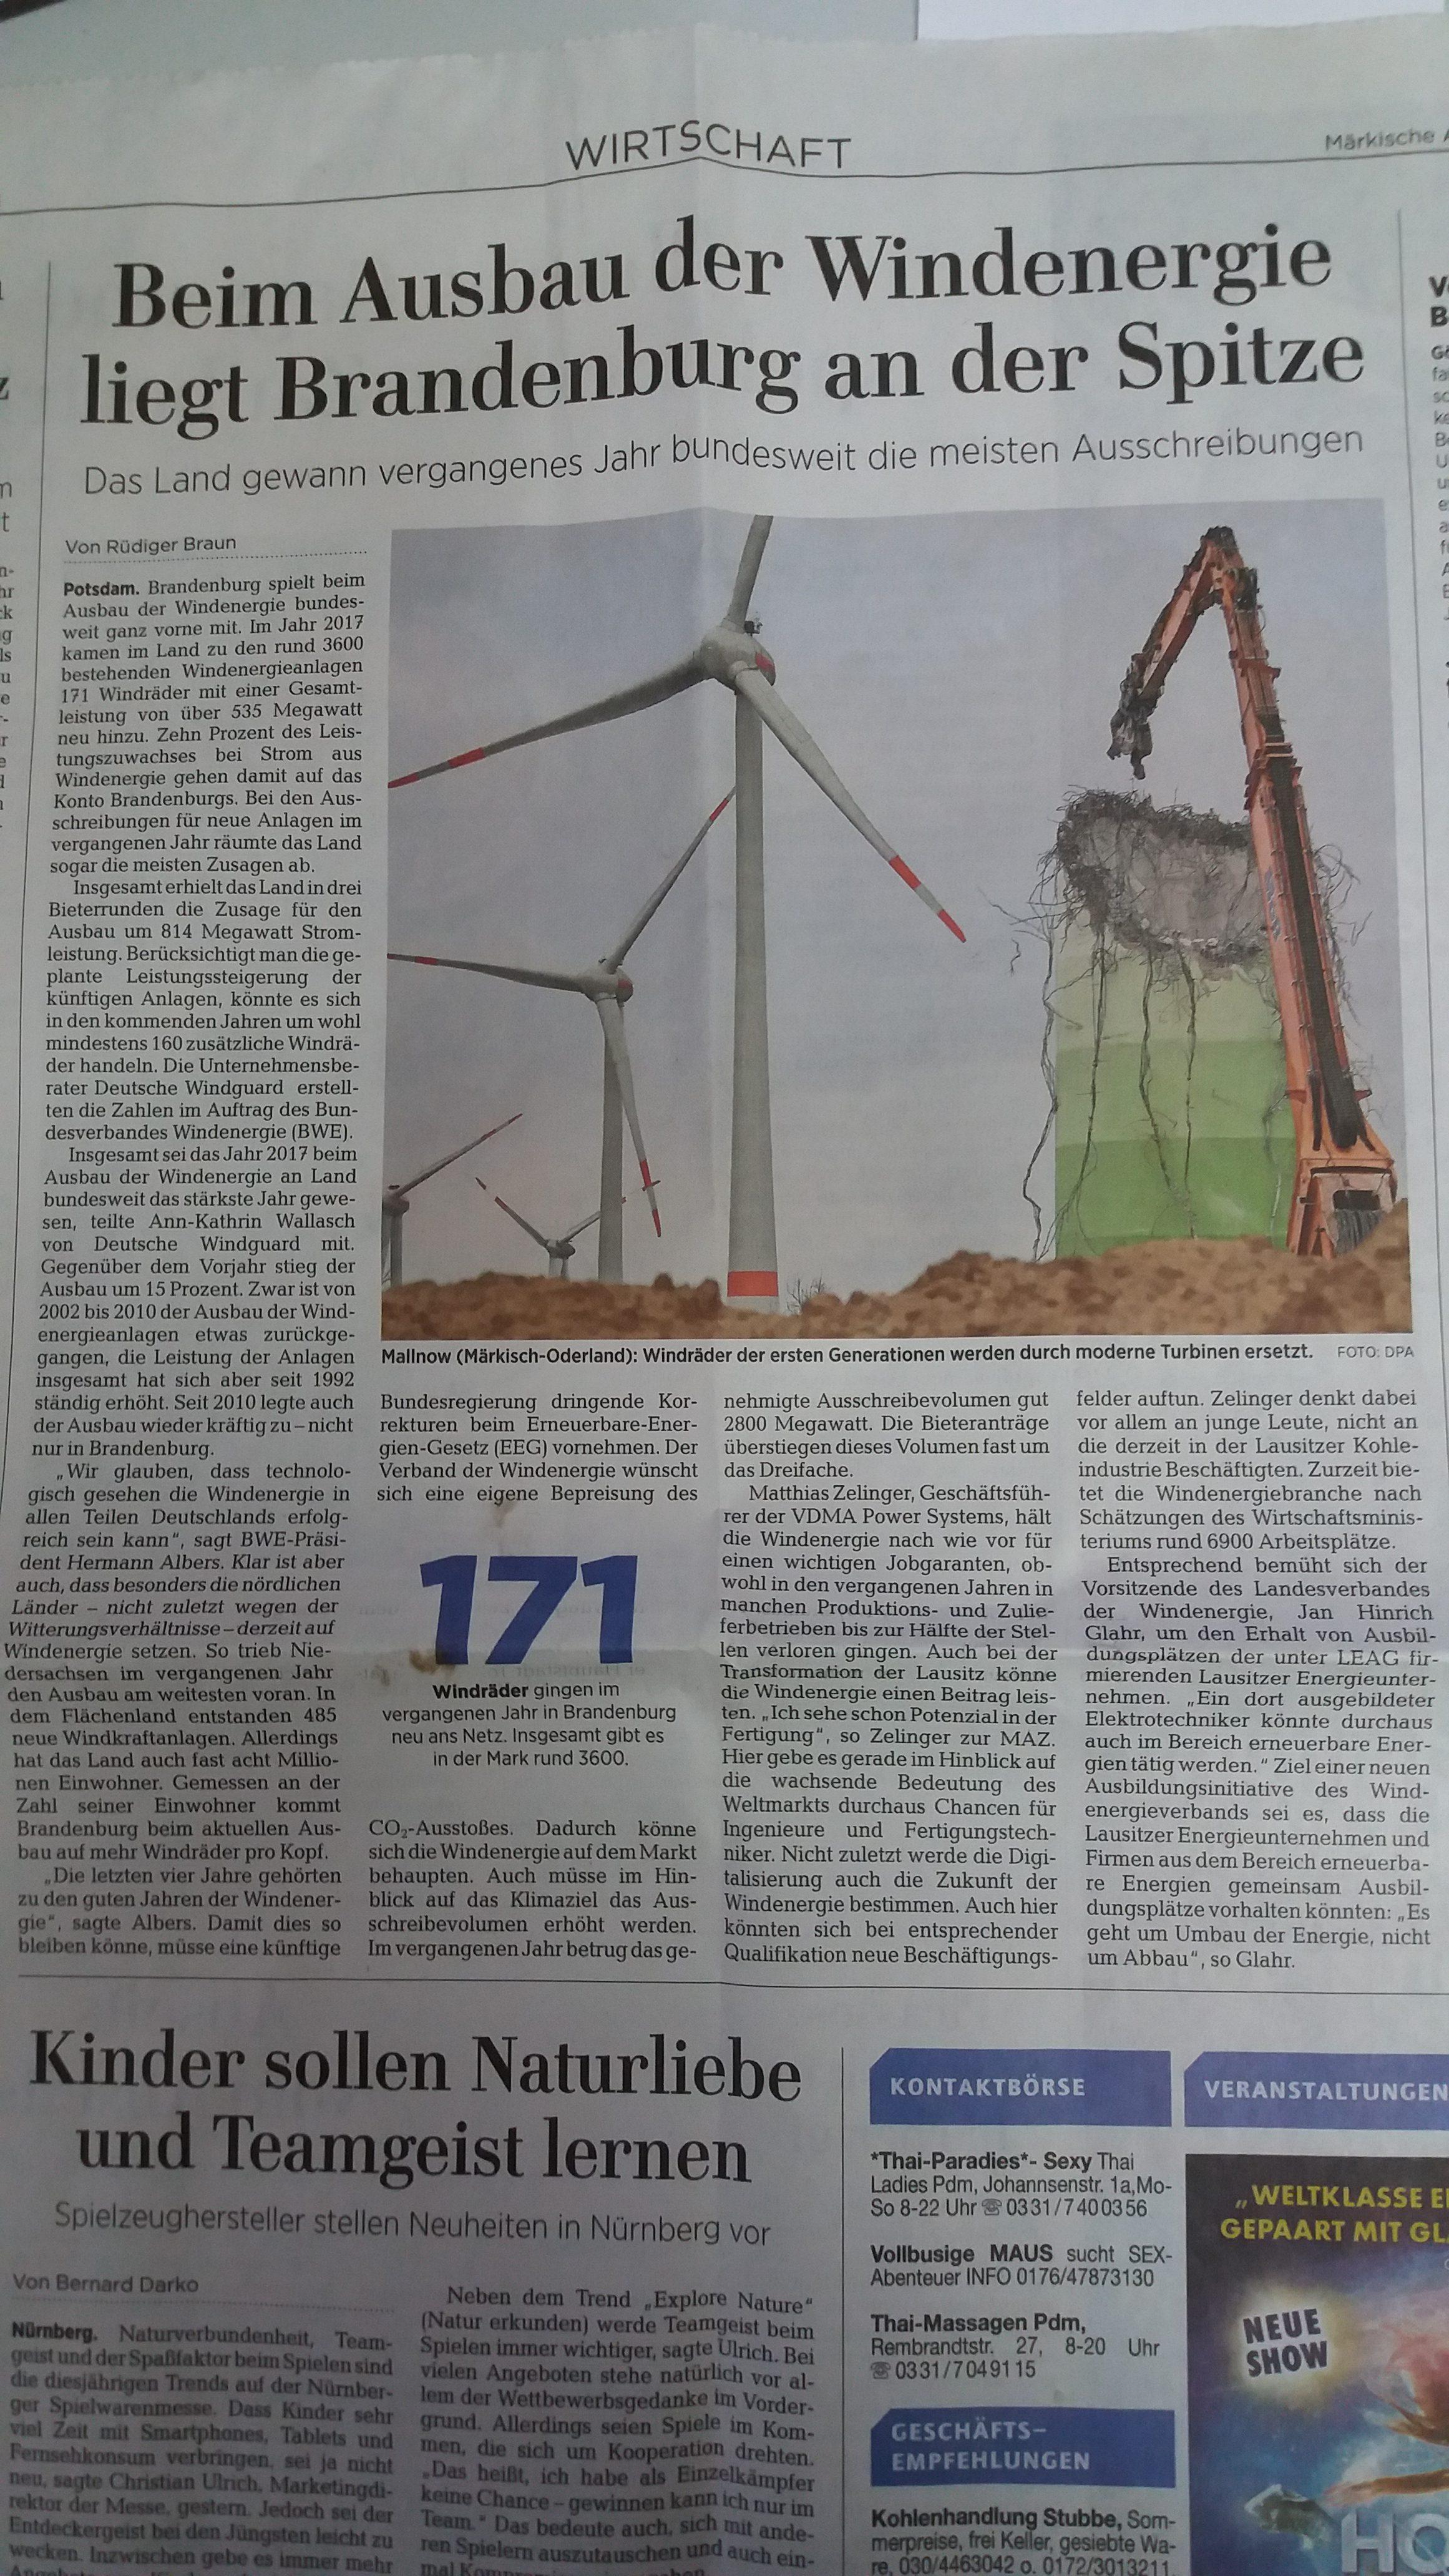 MAZ 26.01.2018 Windenergie